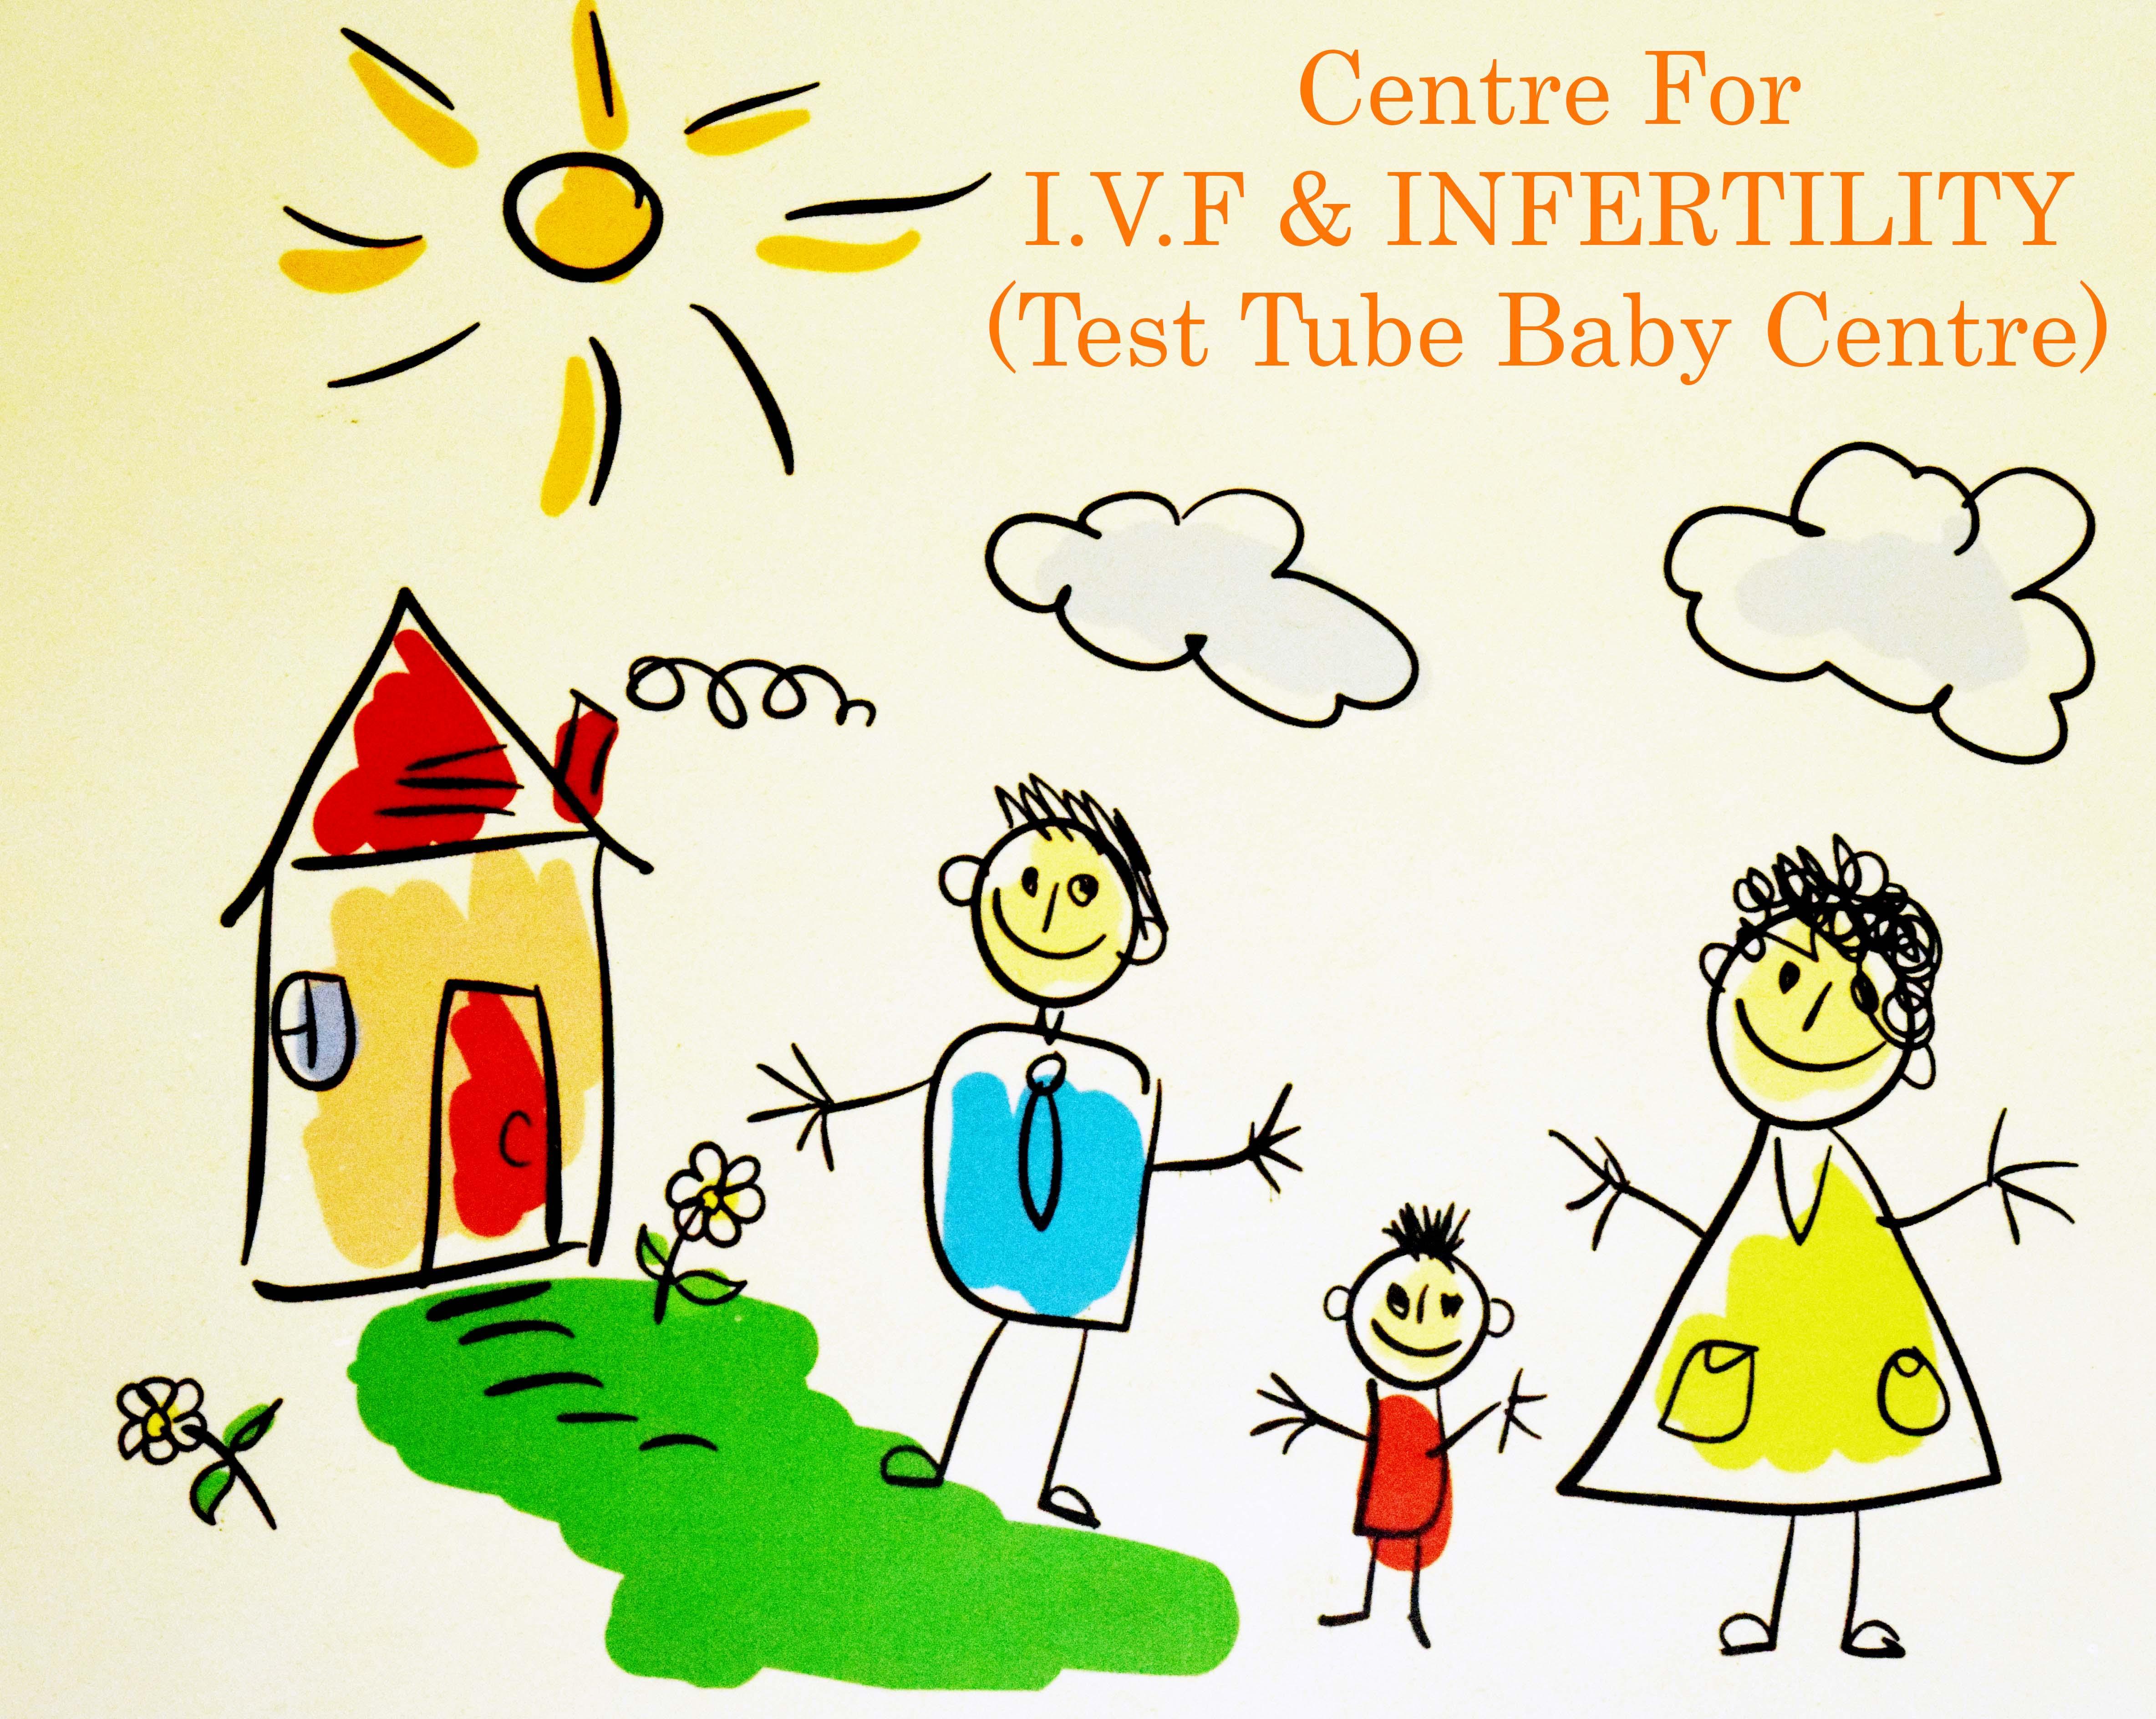 IVF & Infertility Centre